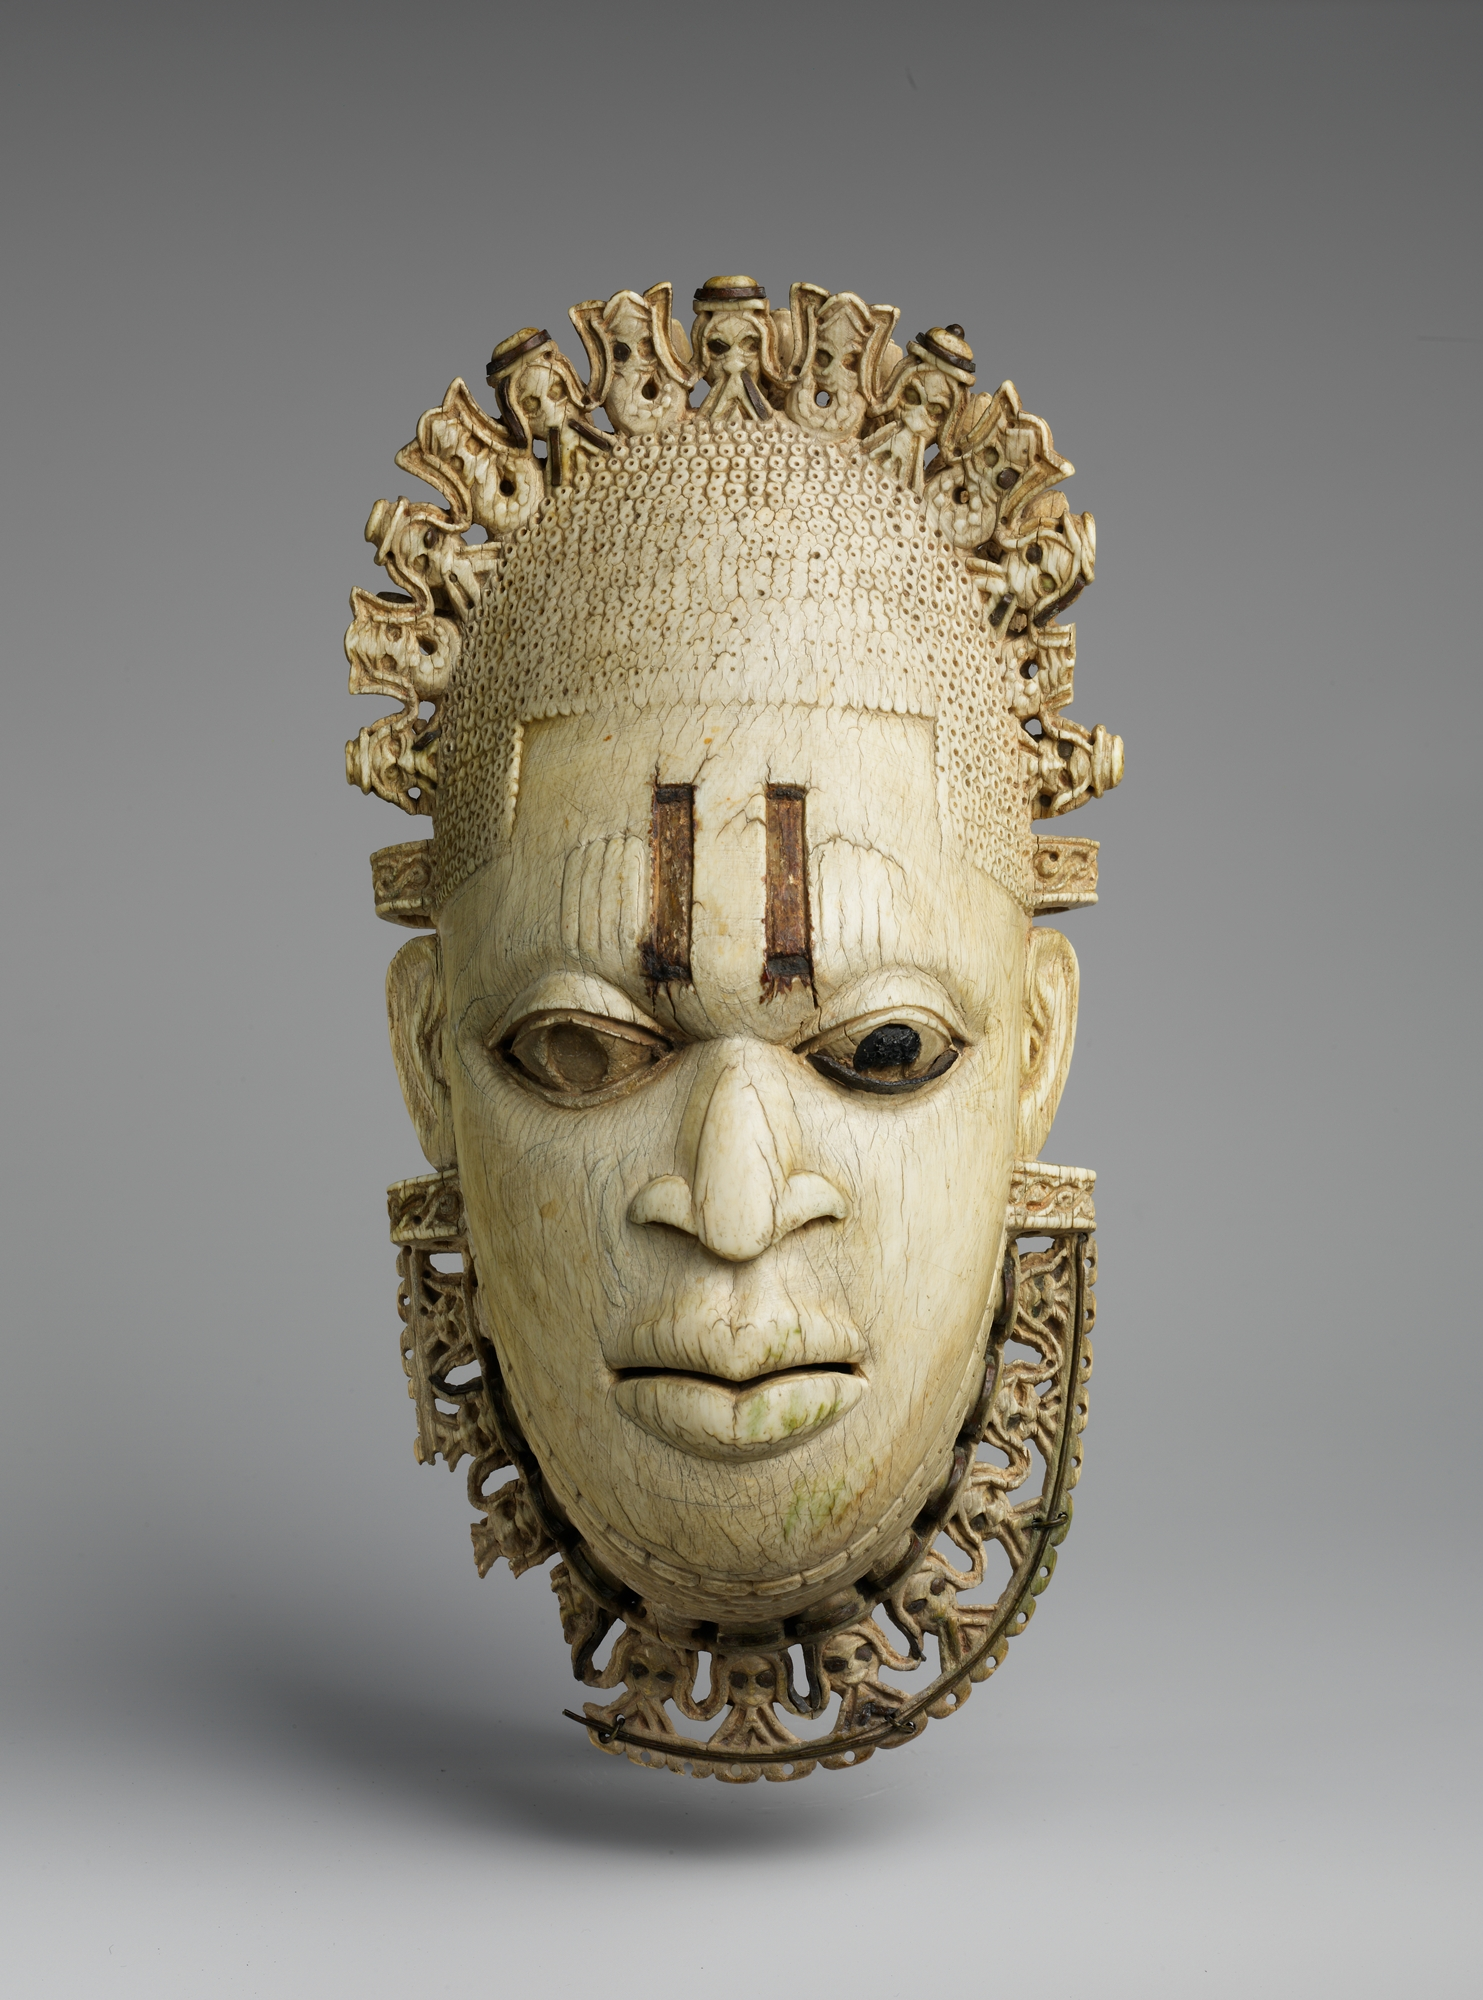 Benin ivory mask